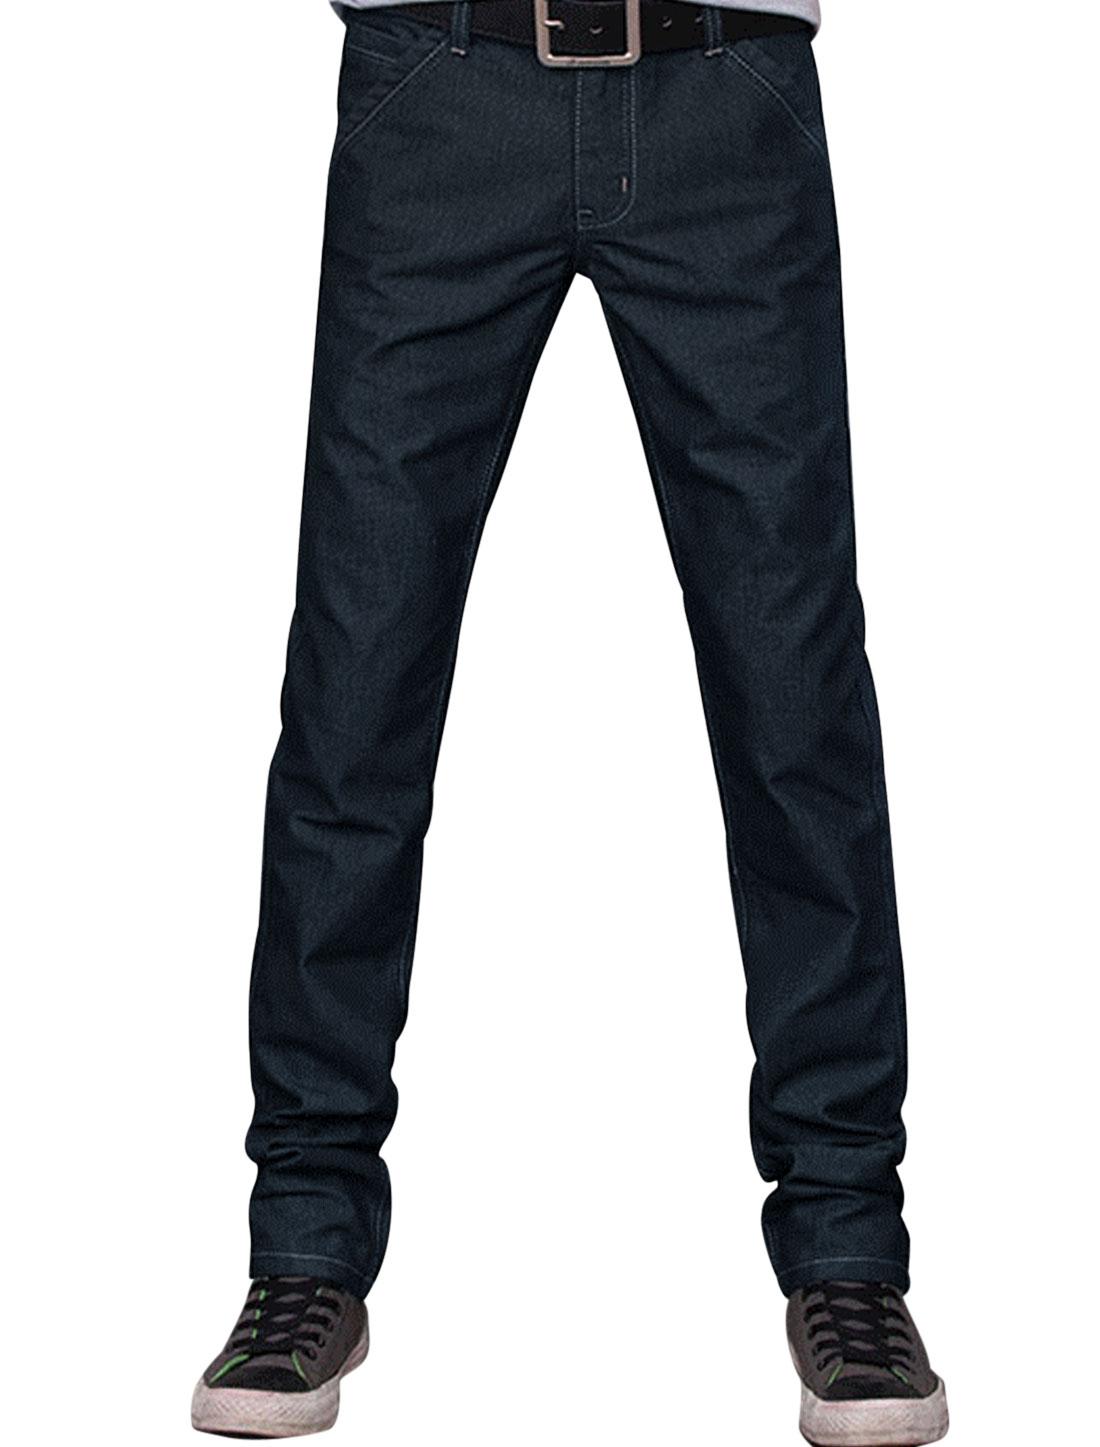 Men Dark Blue Zip Up Closure Two Pockets Back Side Pockets Long Casual Pants W36